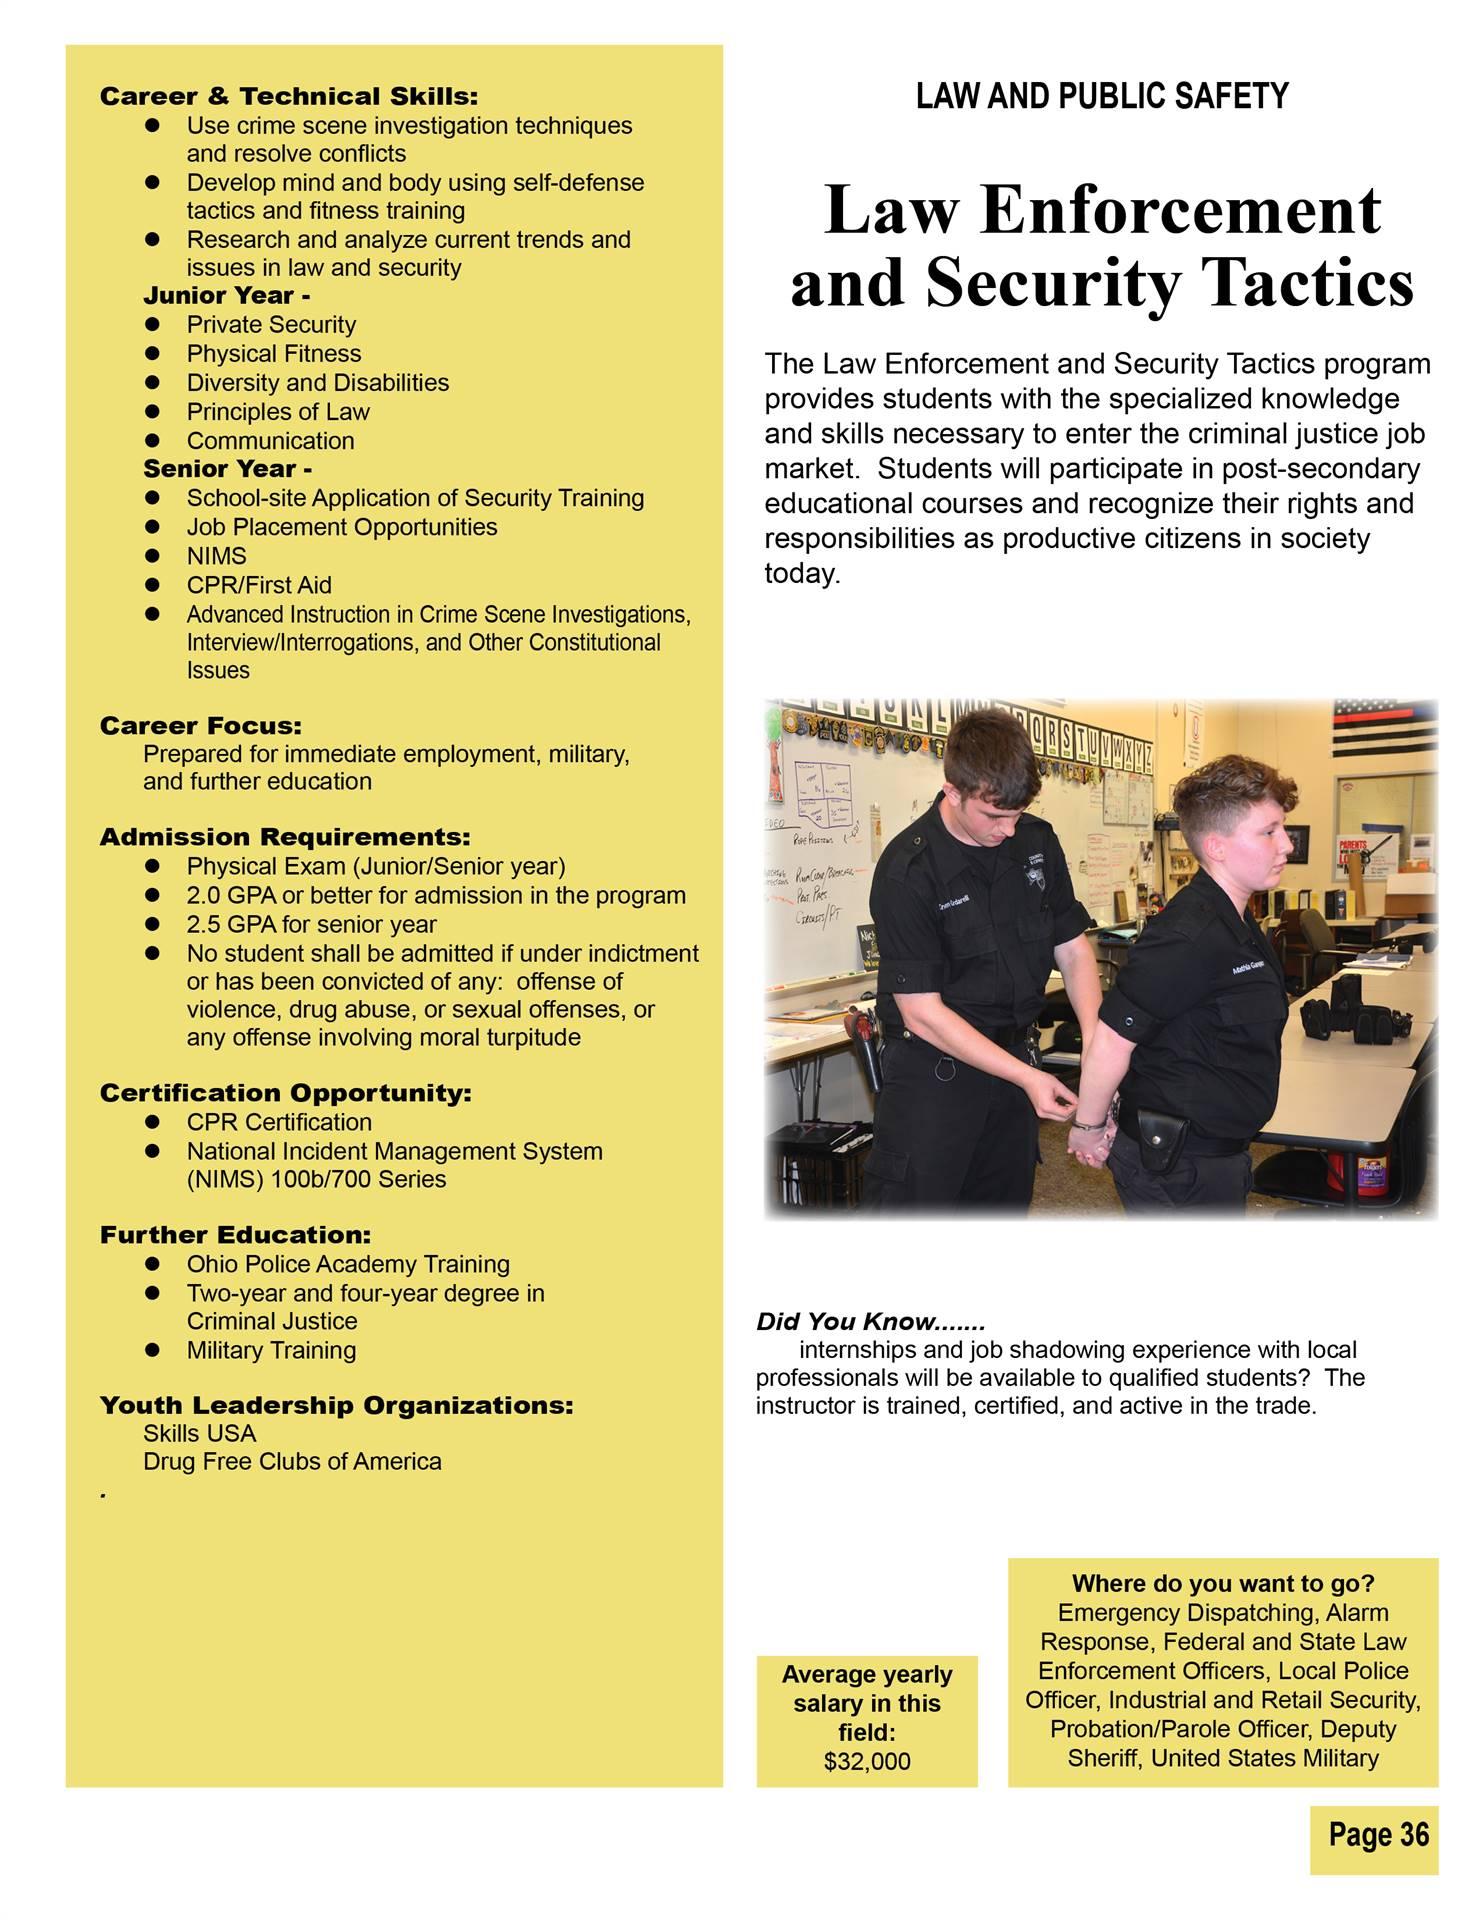 Law Enforcement & Security Tactics